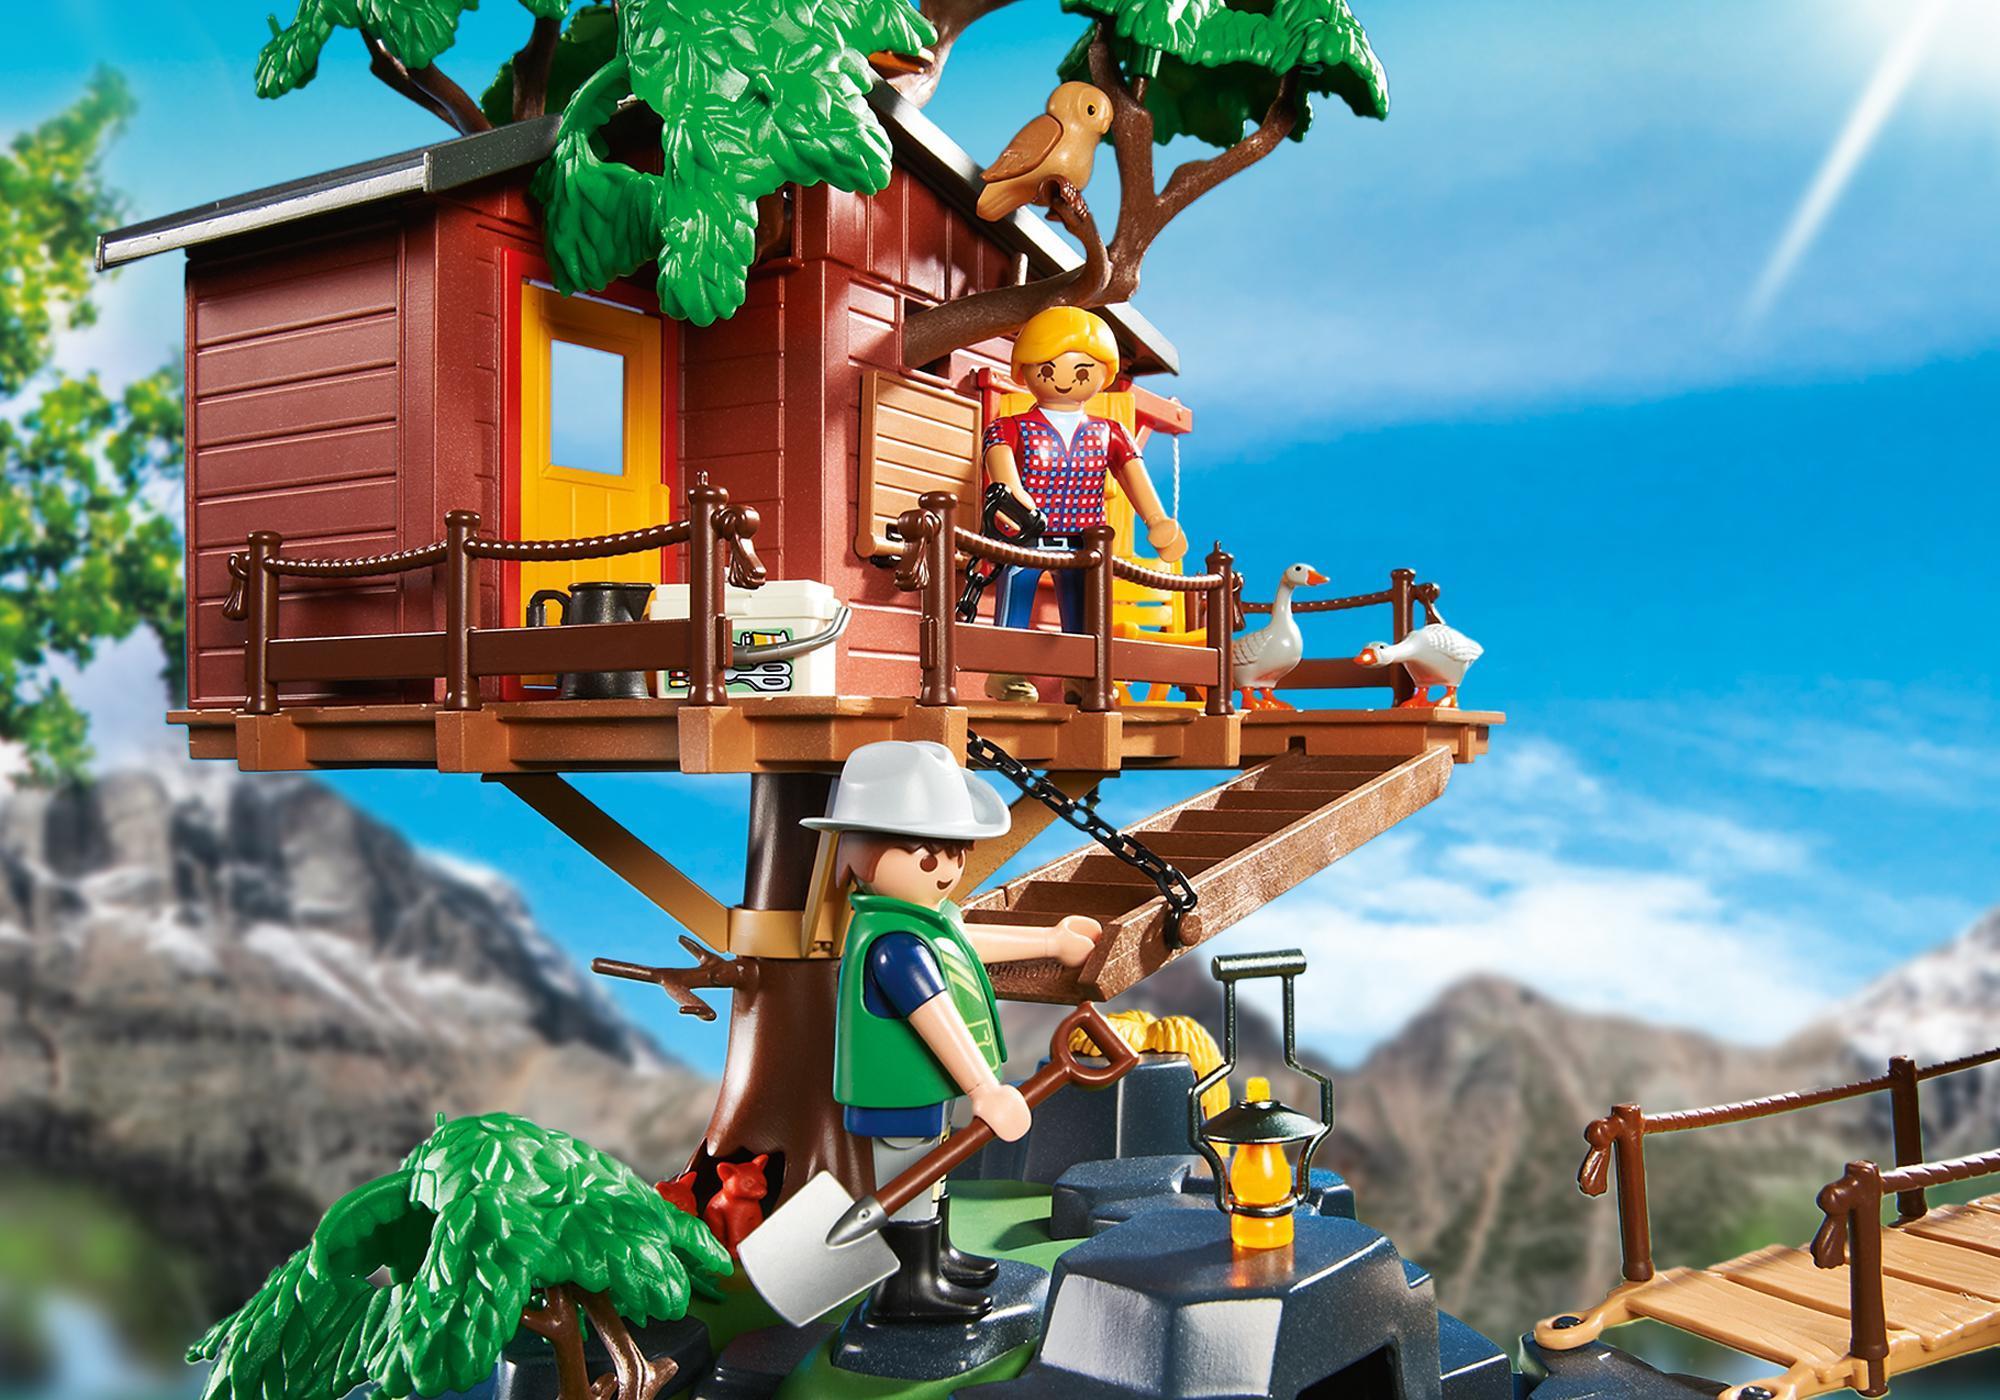 http://media.playmobil.com/i/playmobil/5557_product_extra2/Adventure Tree House